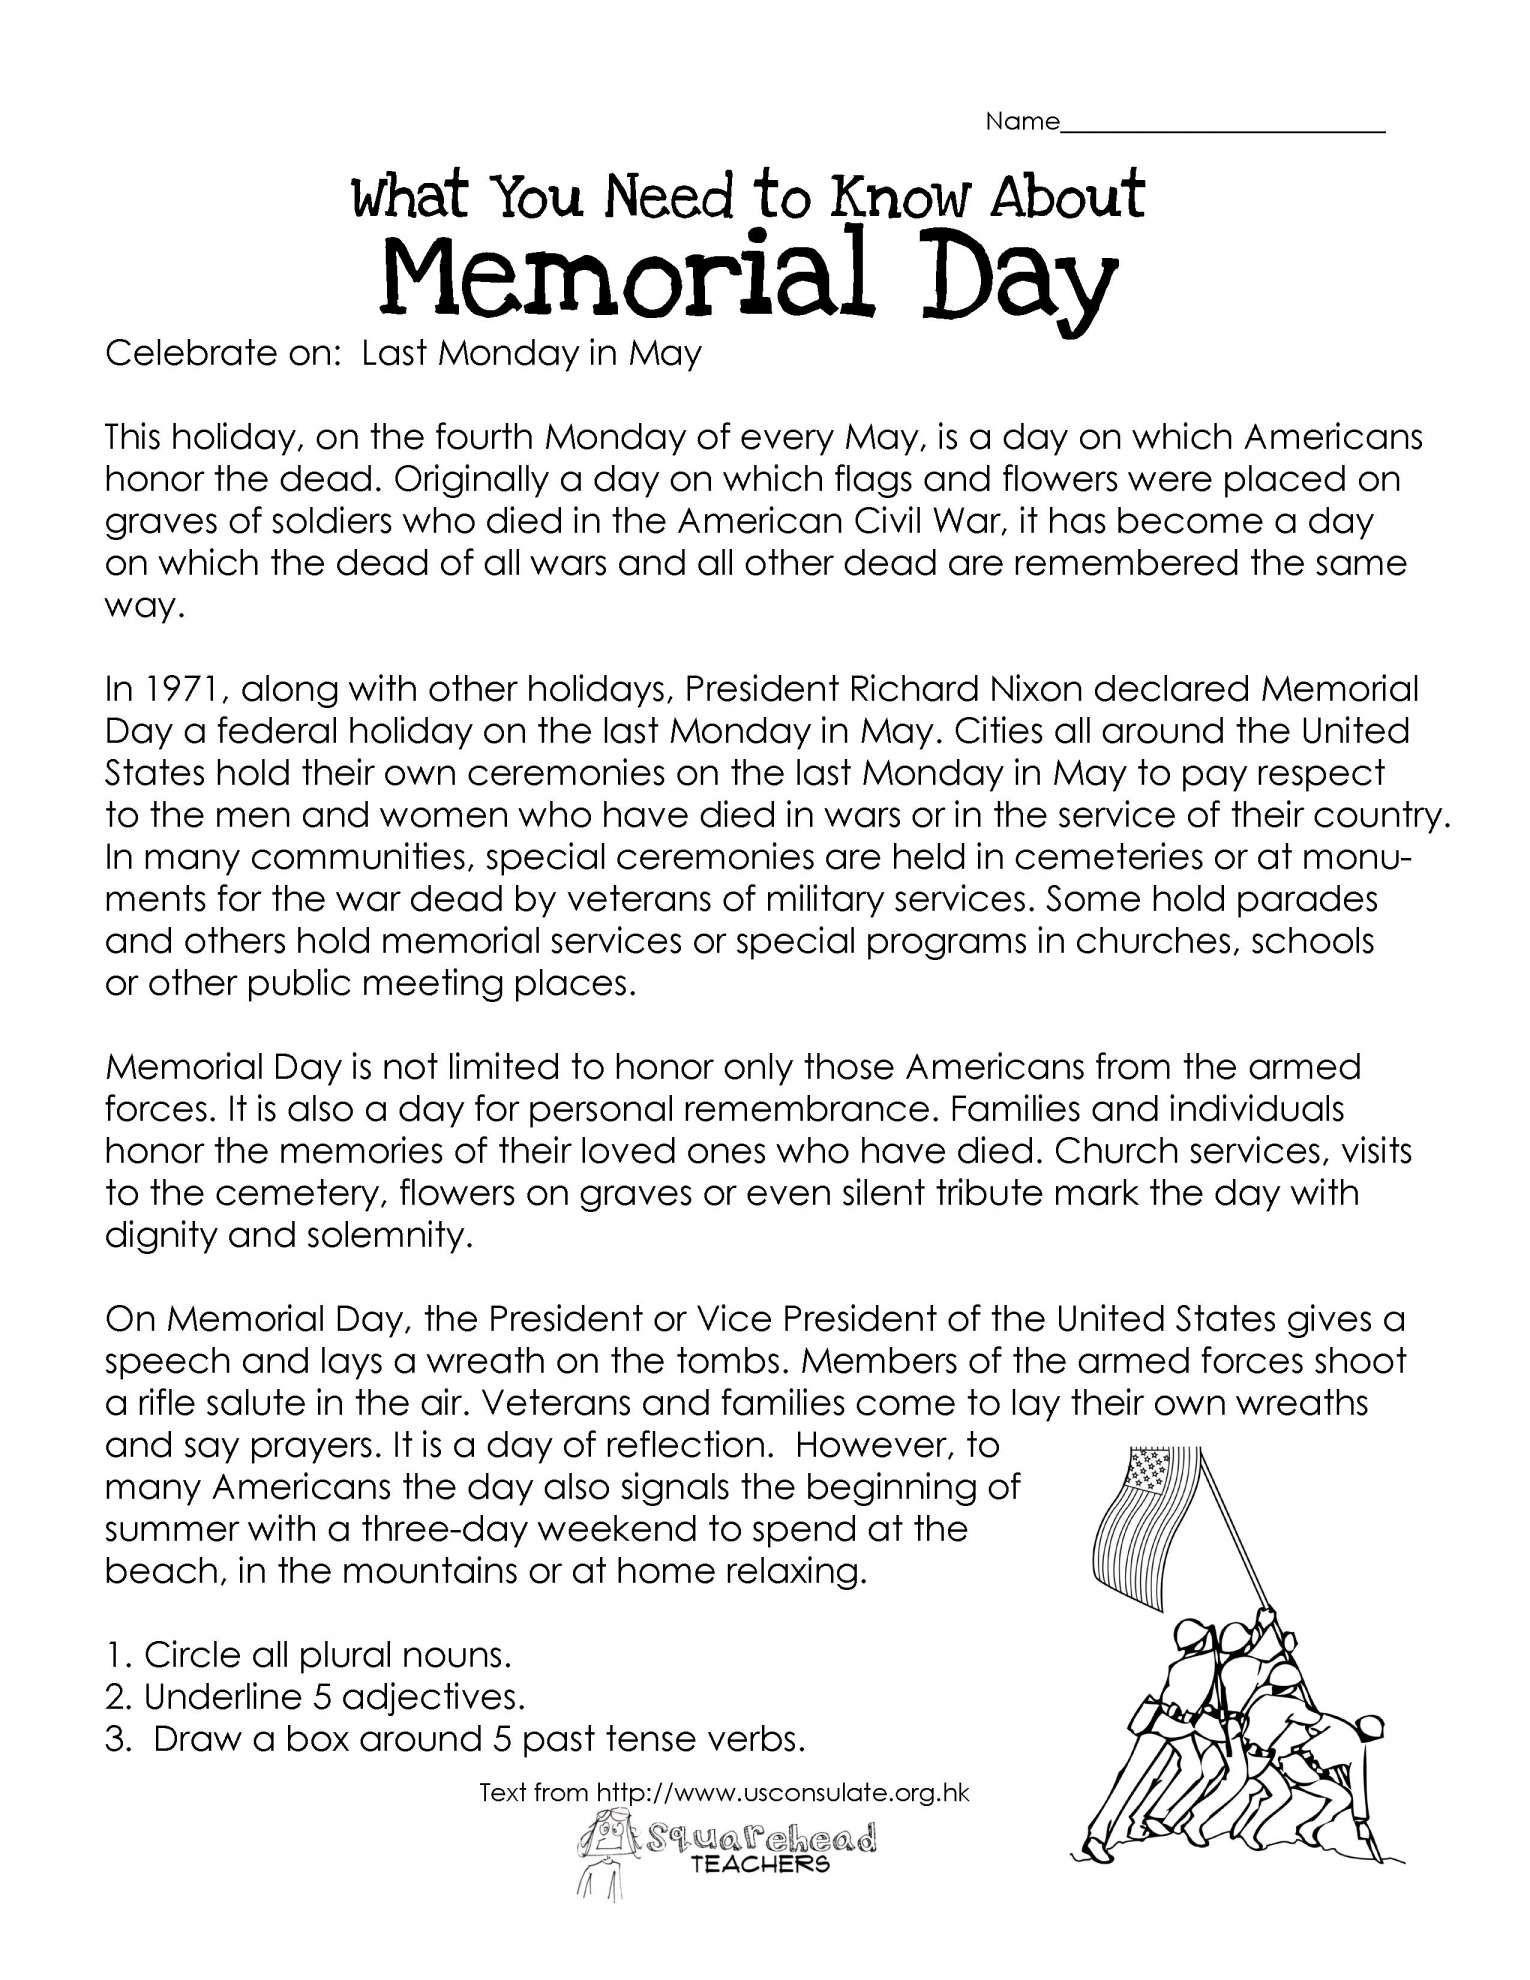 15 Memorial Day Worksheets 4th Grade In